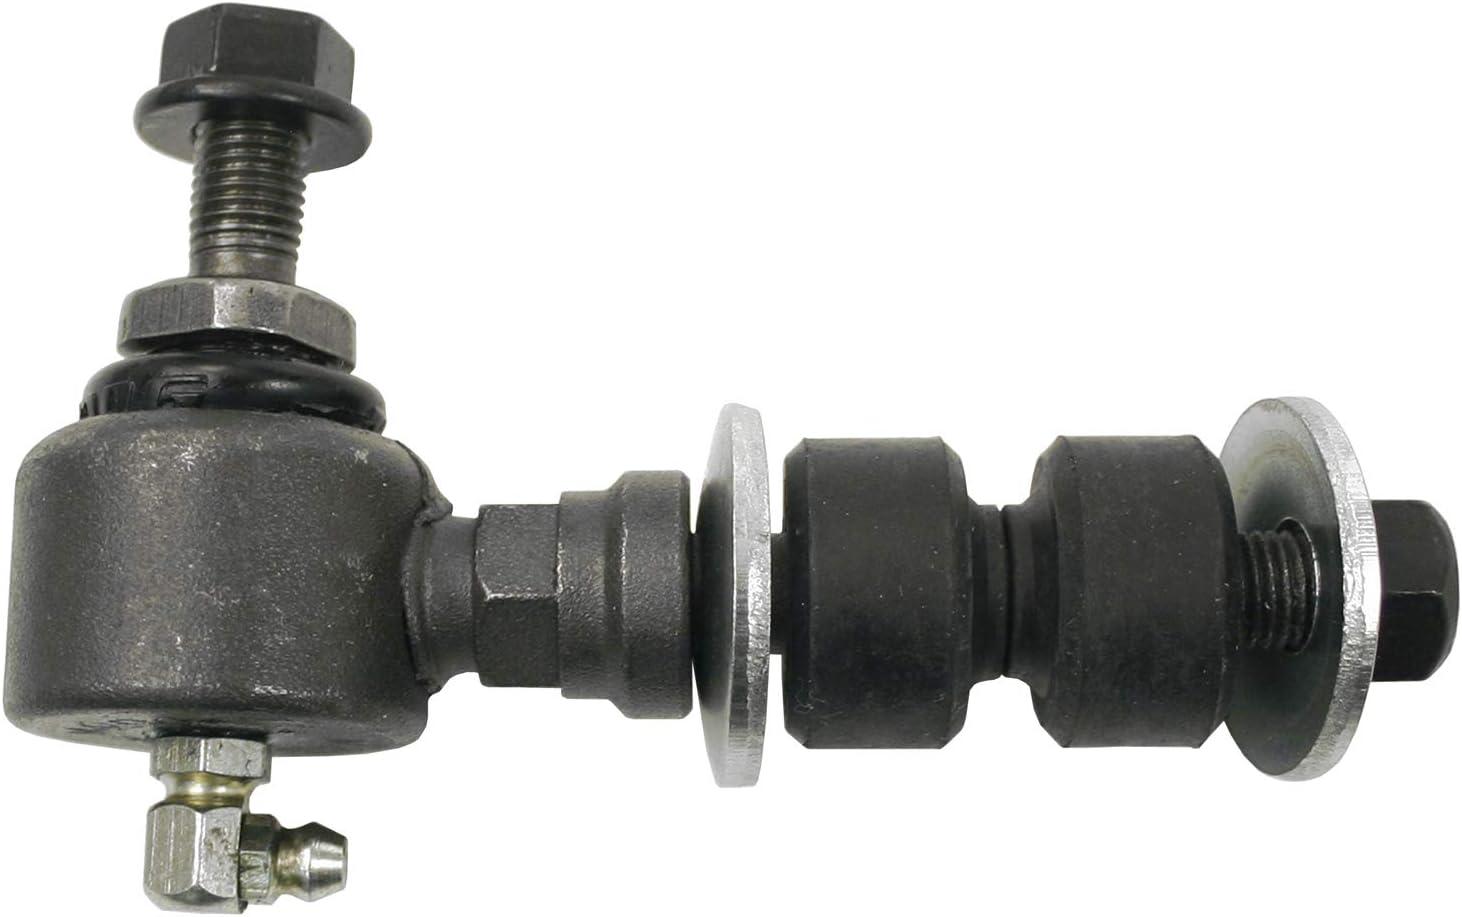 MC K7422 Front Suspension Stabilizer Bar Link for Left and Right Side Set of 2